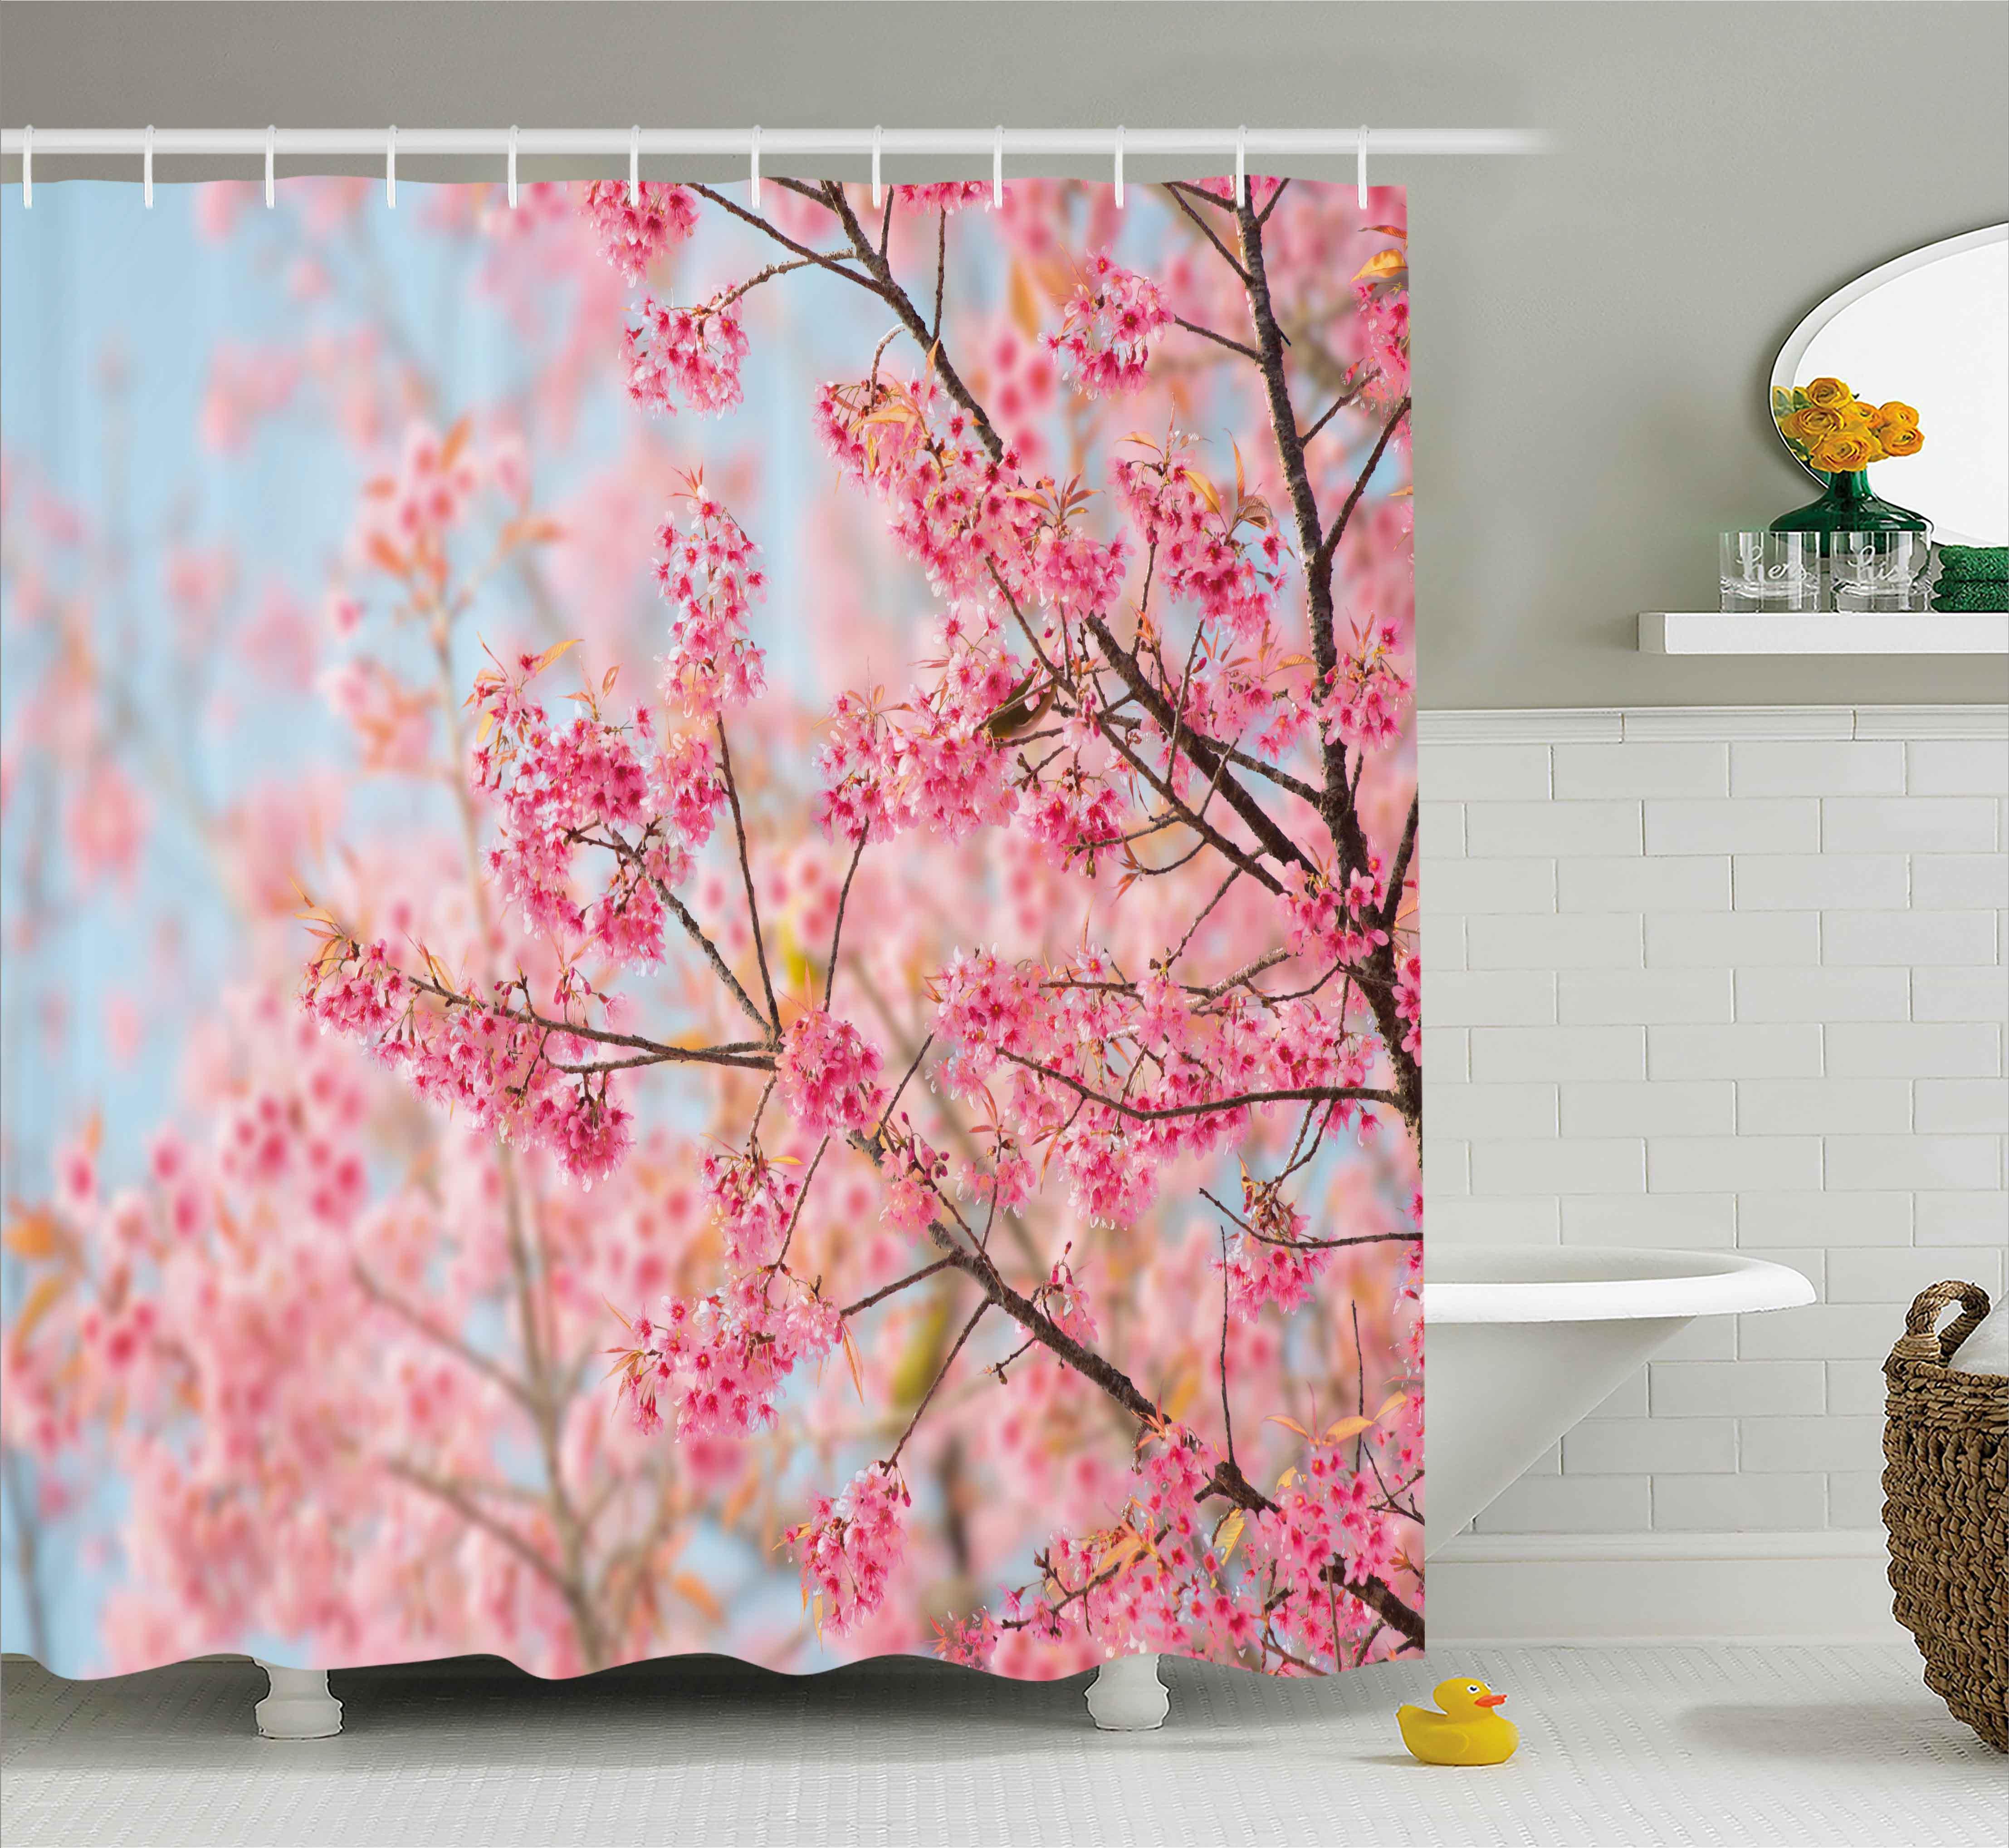 Floral Shower Curtain, Japanese Sakura Cherry Blossom Branches Full ...